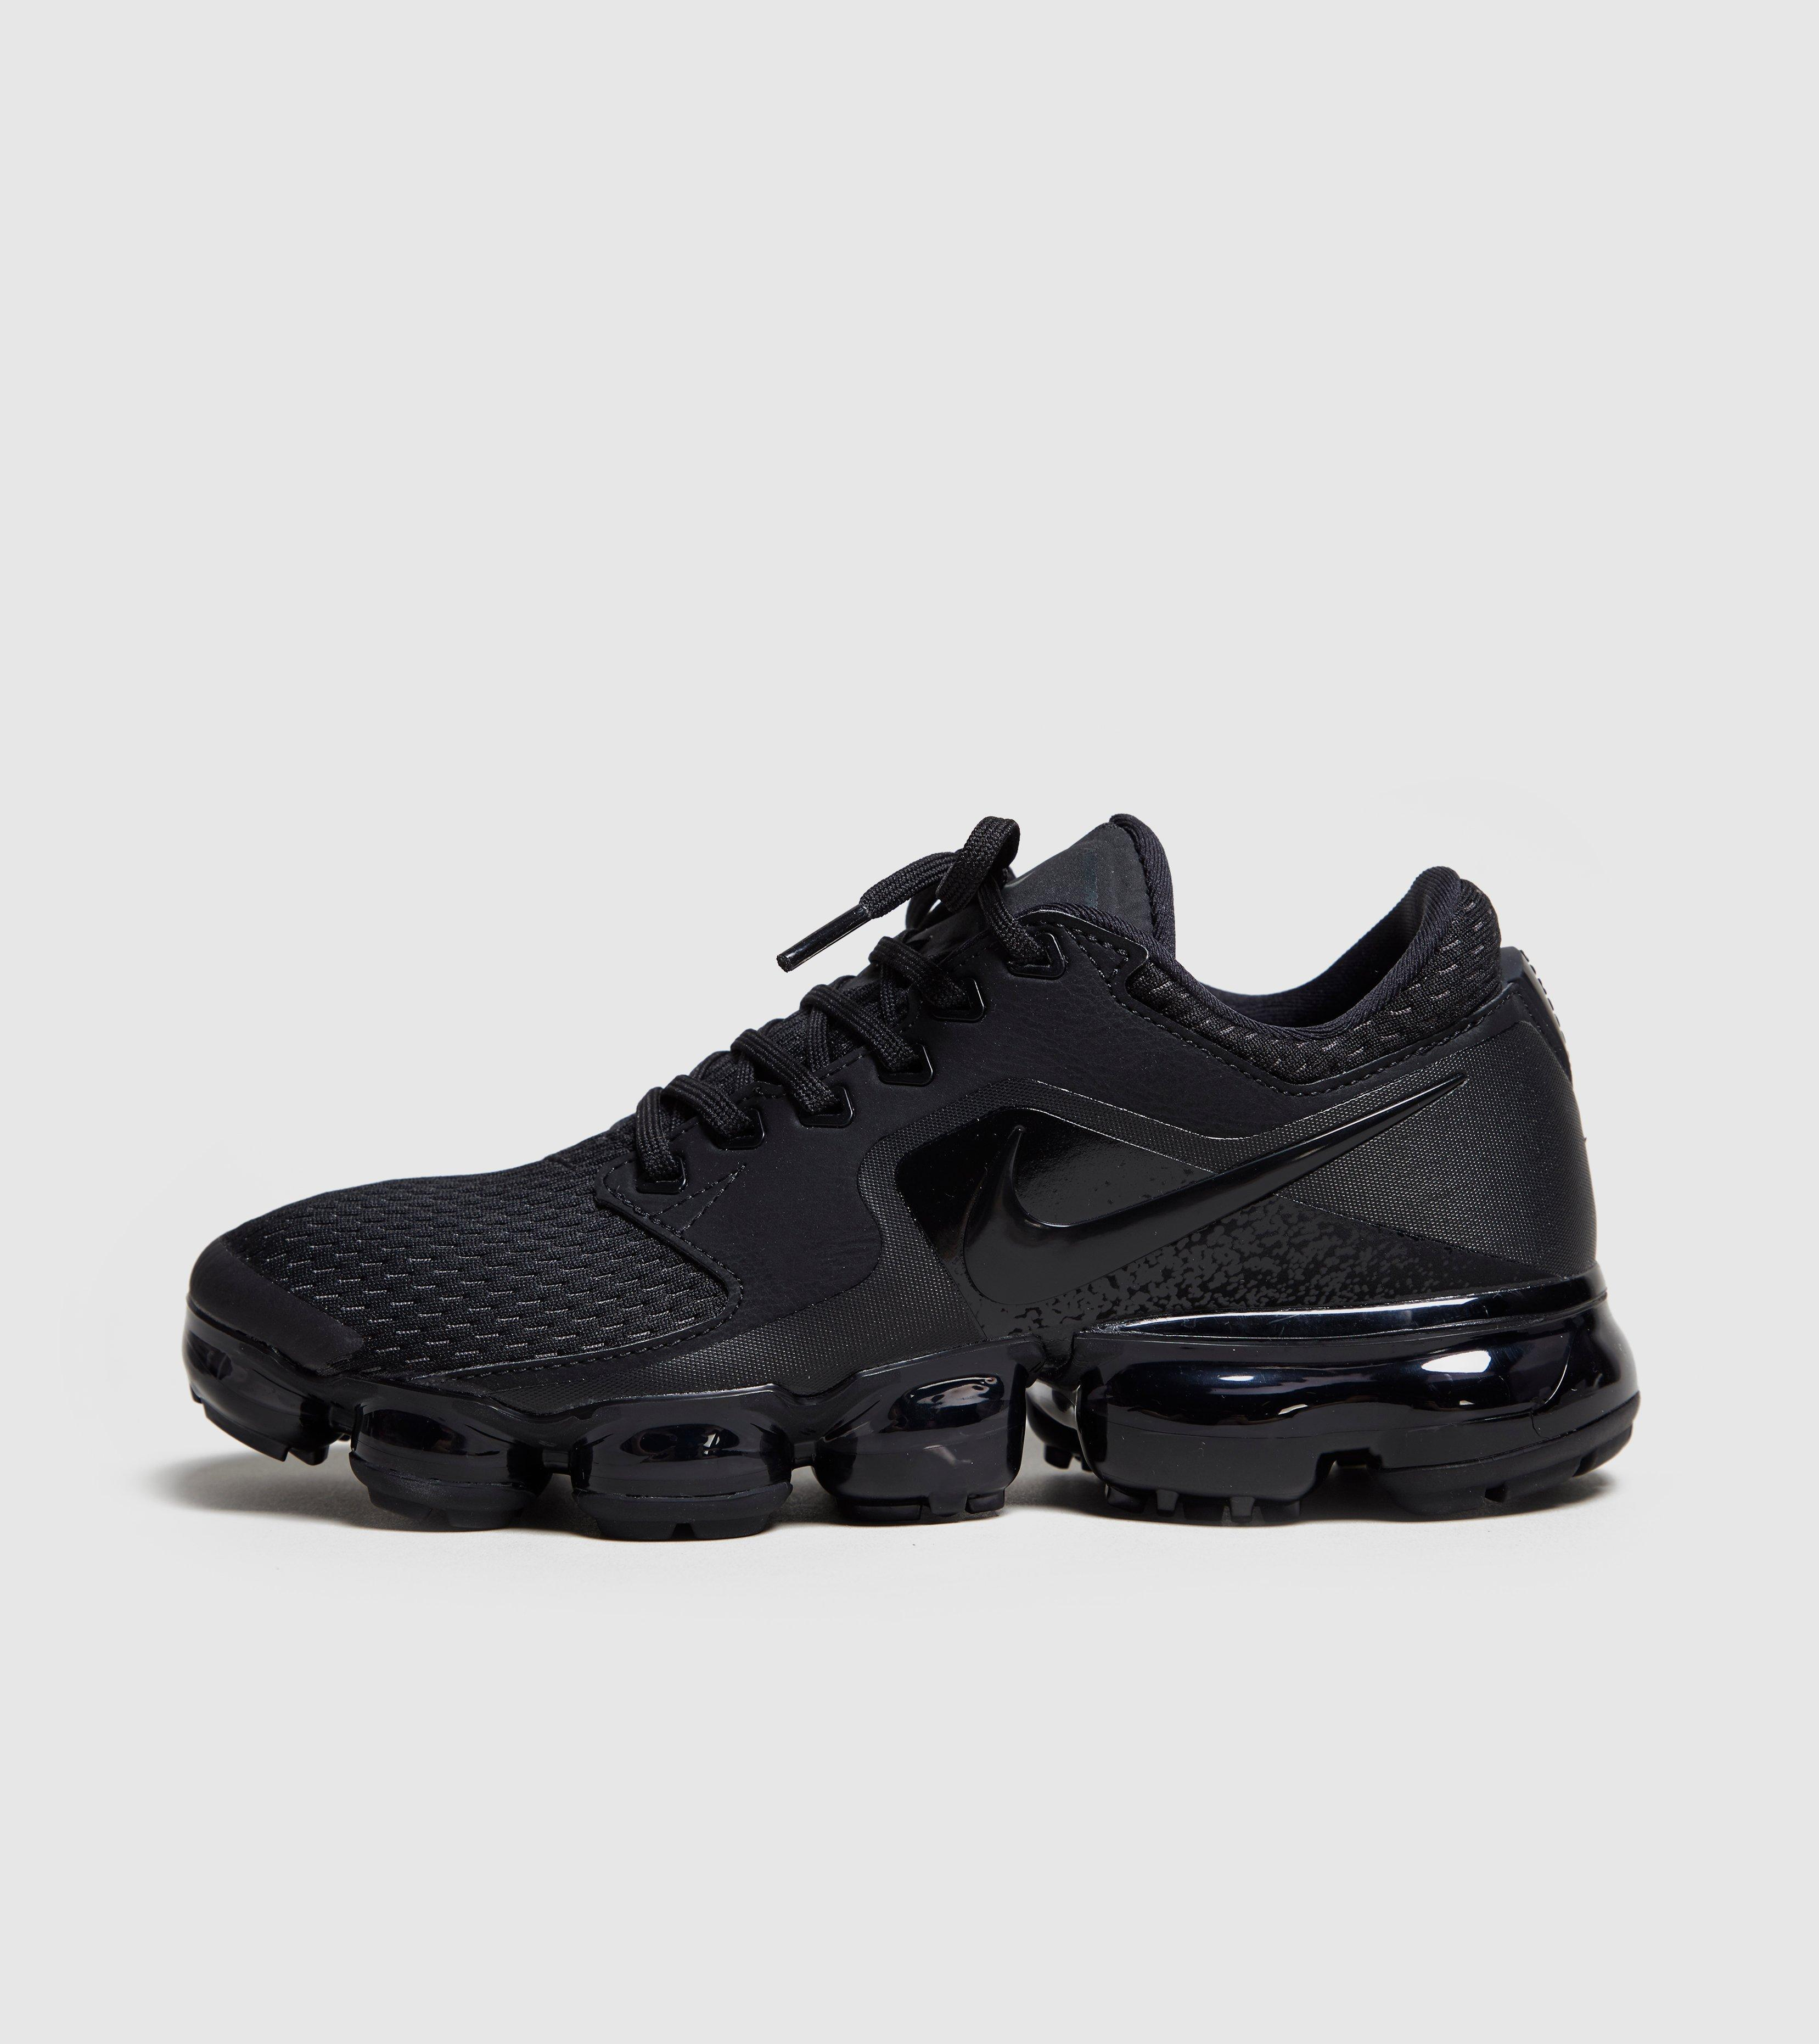 723d7cfe679 Nike Air Vapormax Mesh Women s in Black - Lyst